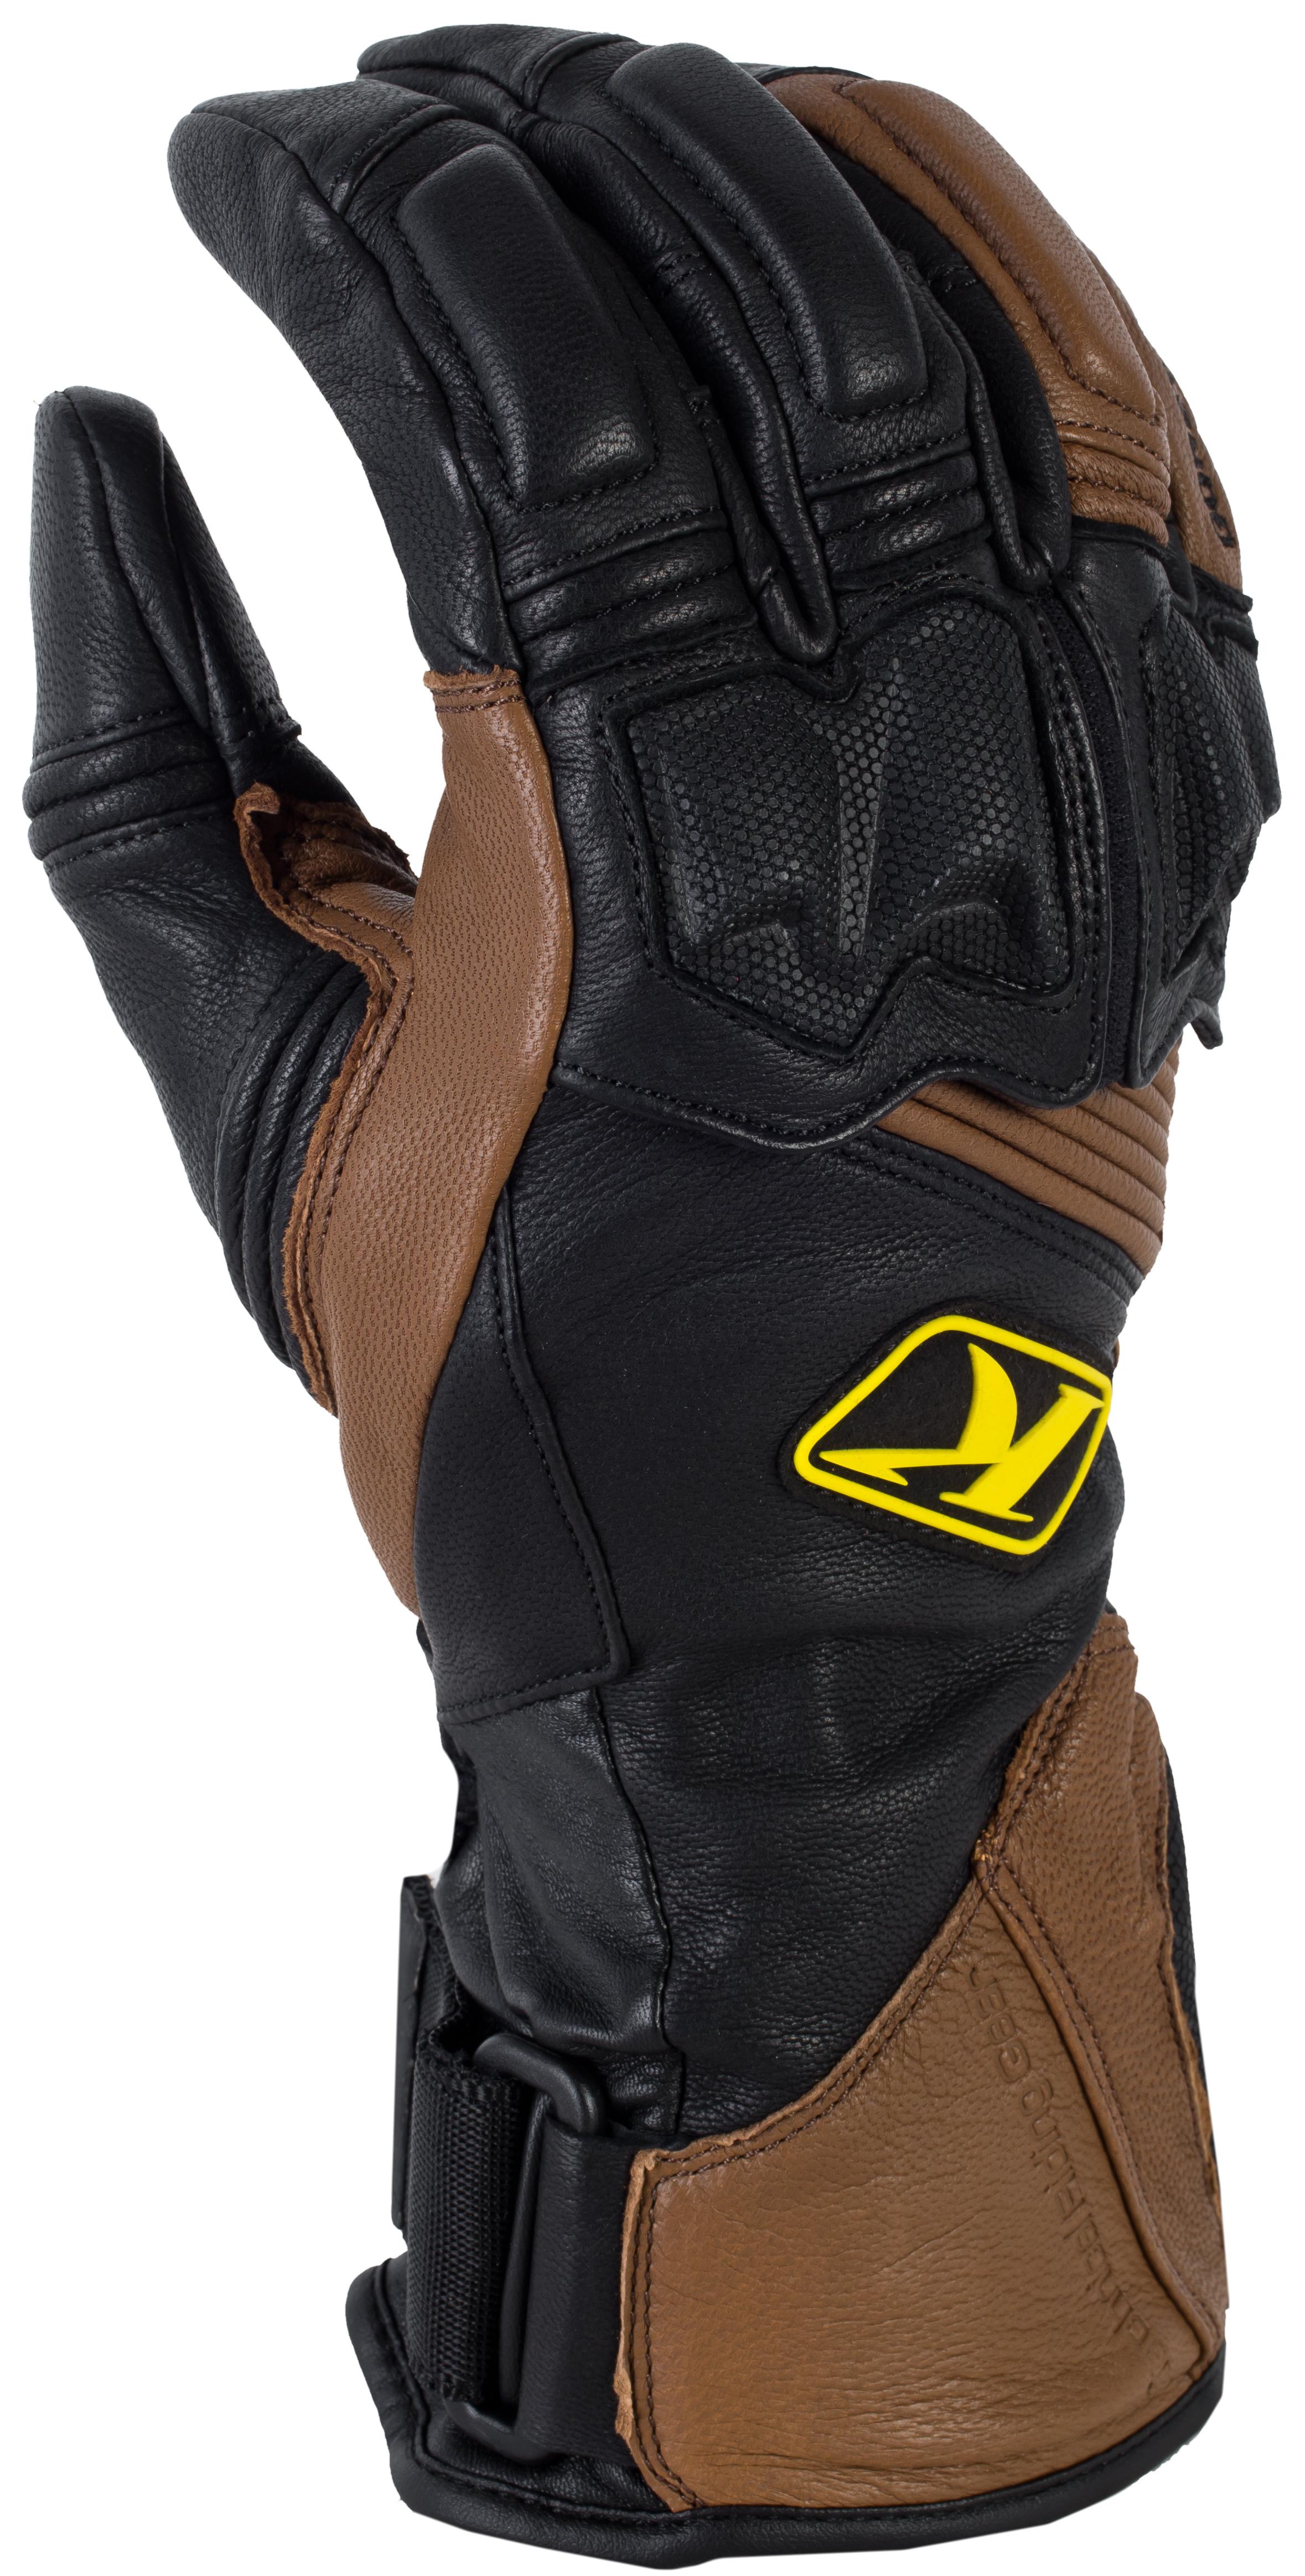 Adventure Glove Long 5032-001-900